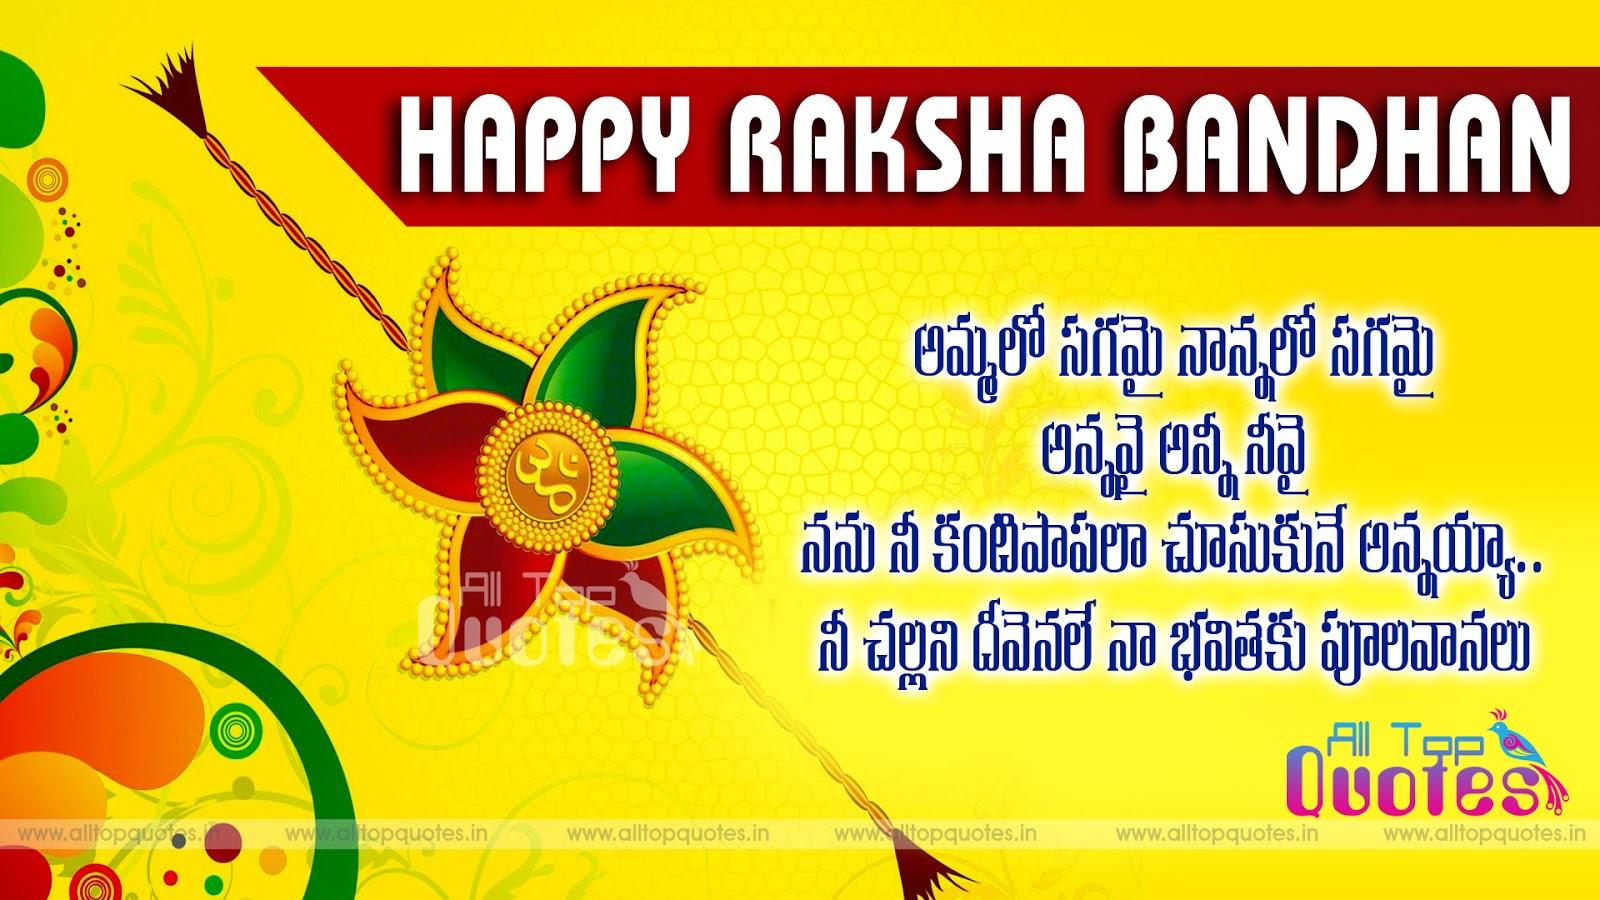 Happy Raksha Bandhan WhatsApp Status in Urdu, Marathi & Tamil